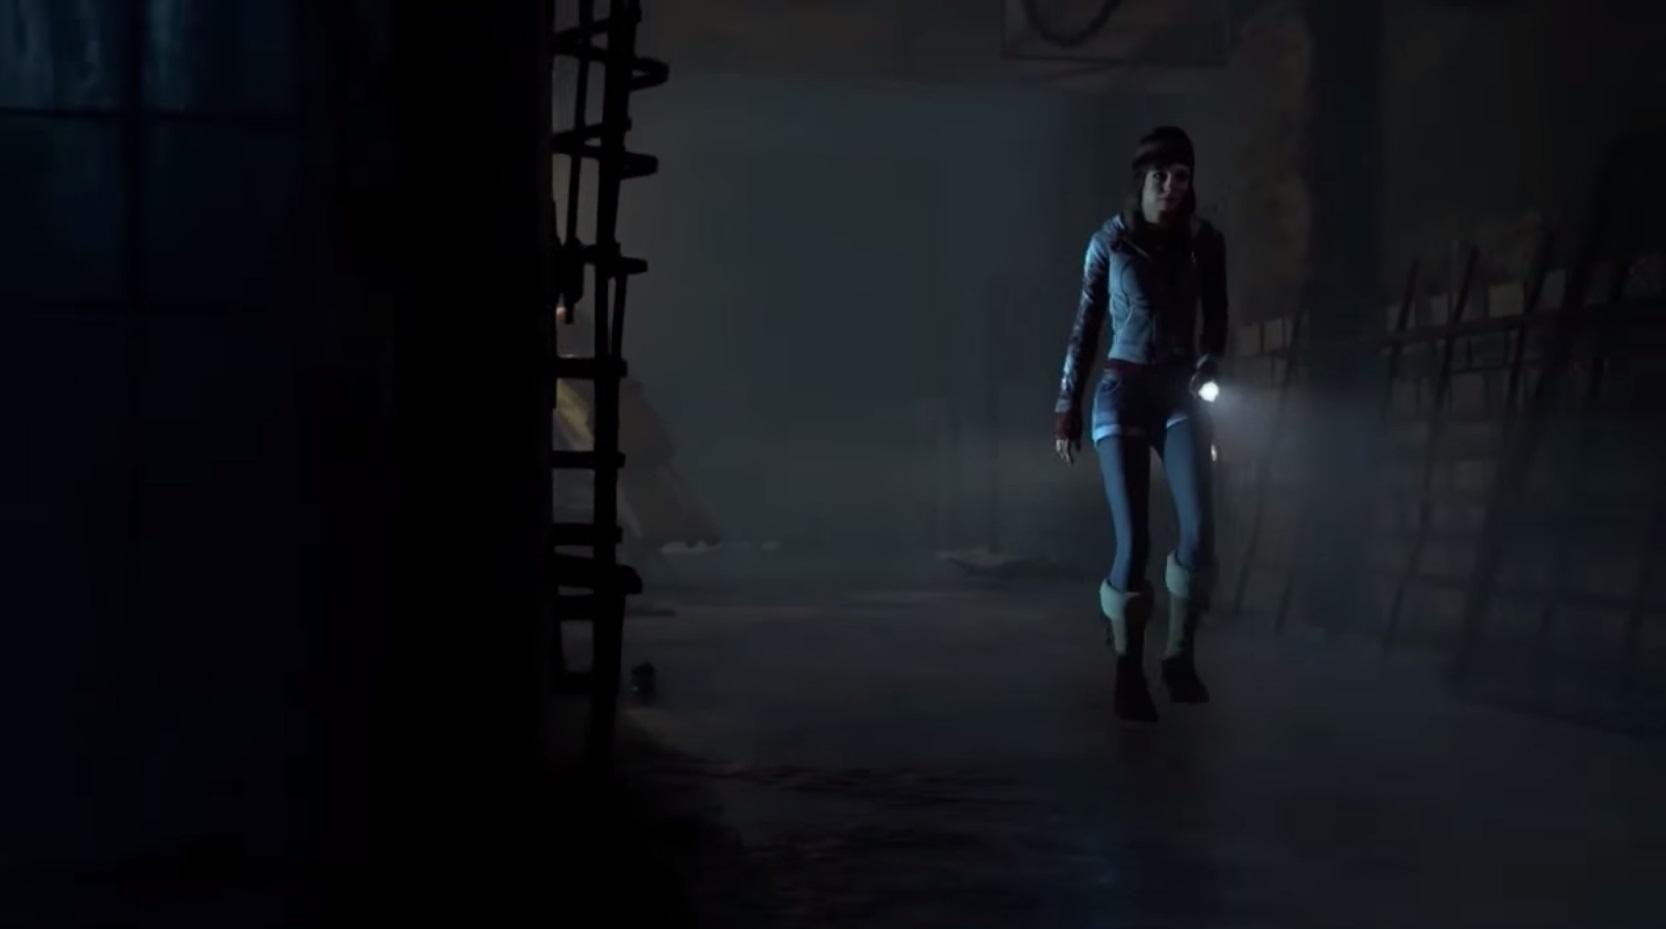 until-dawn-gameplay-screenshot-hallway-ps4